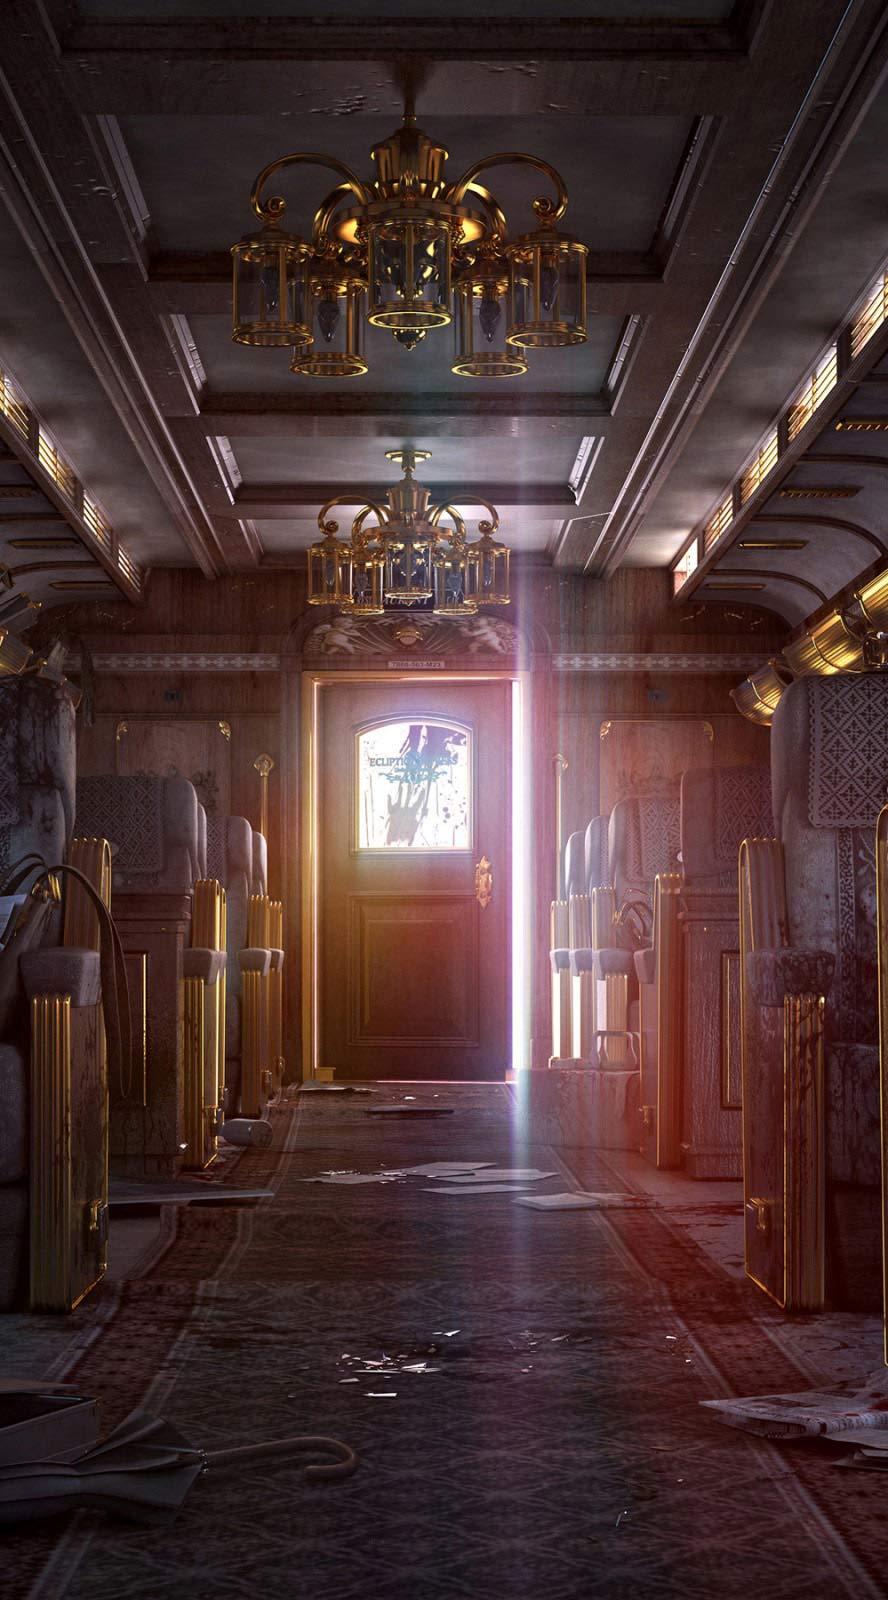 Games-wallpapers-Resident-Evil-Zero-Wallpapers-http-www-fabuloussavers-com-Resident-Evil-Zero-Wa-wallpaper-wp4806713